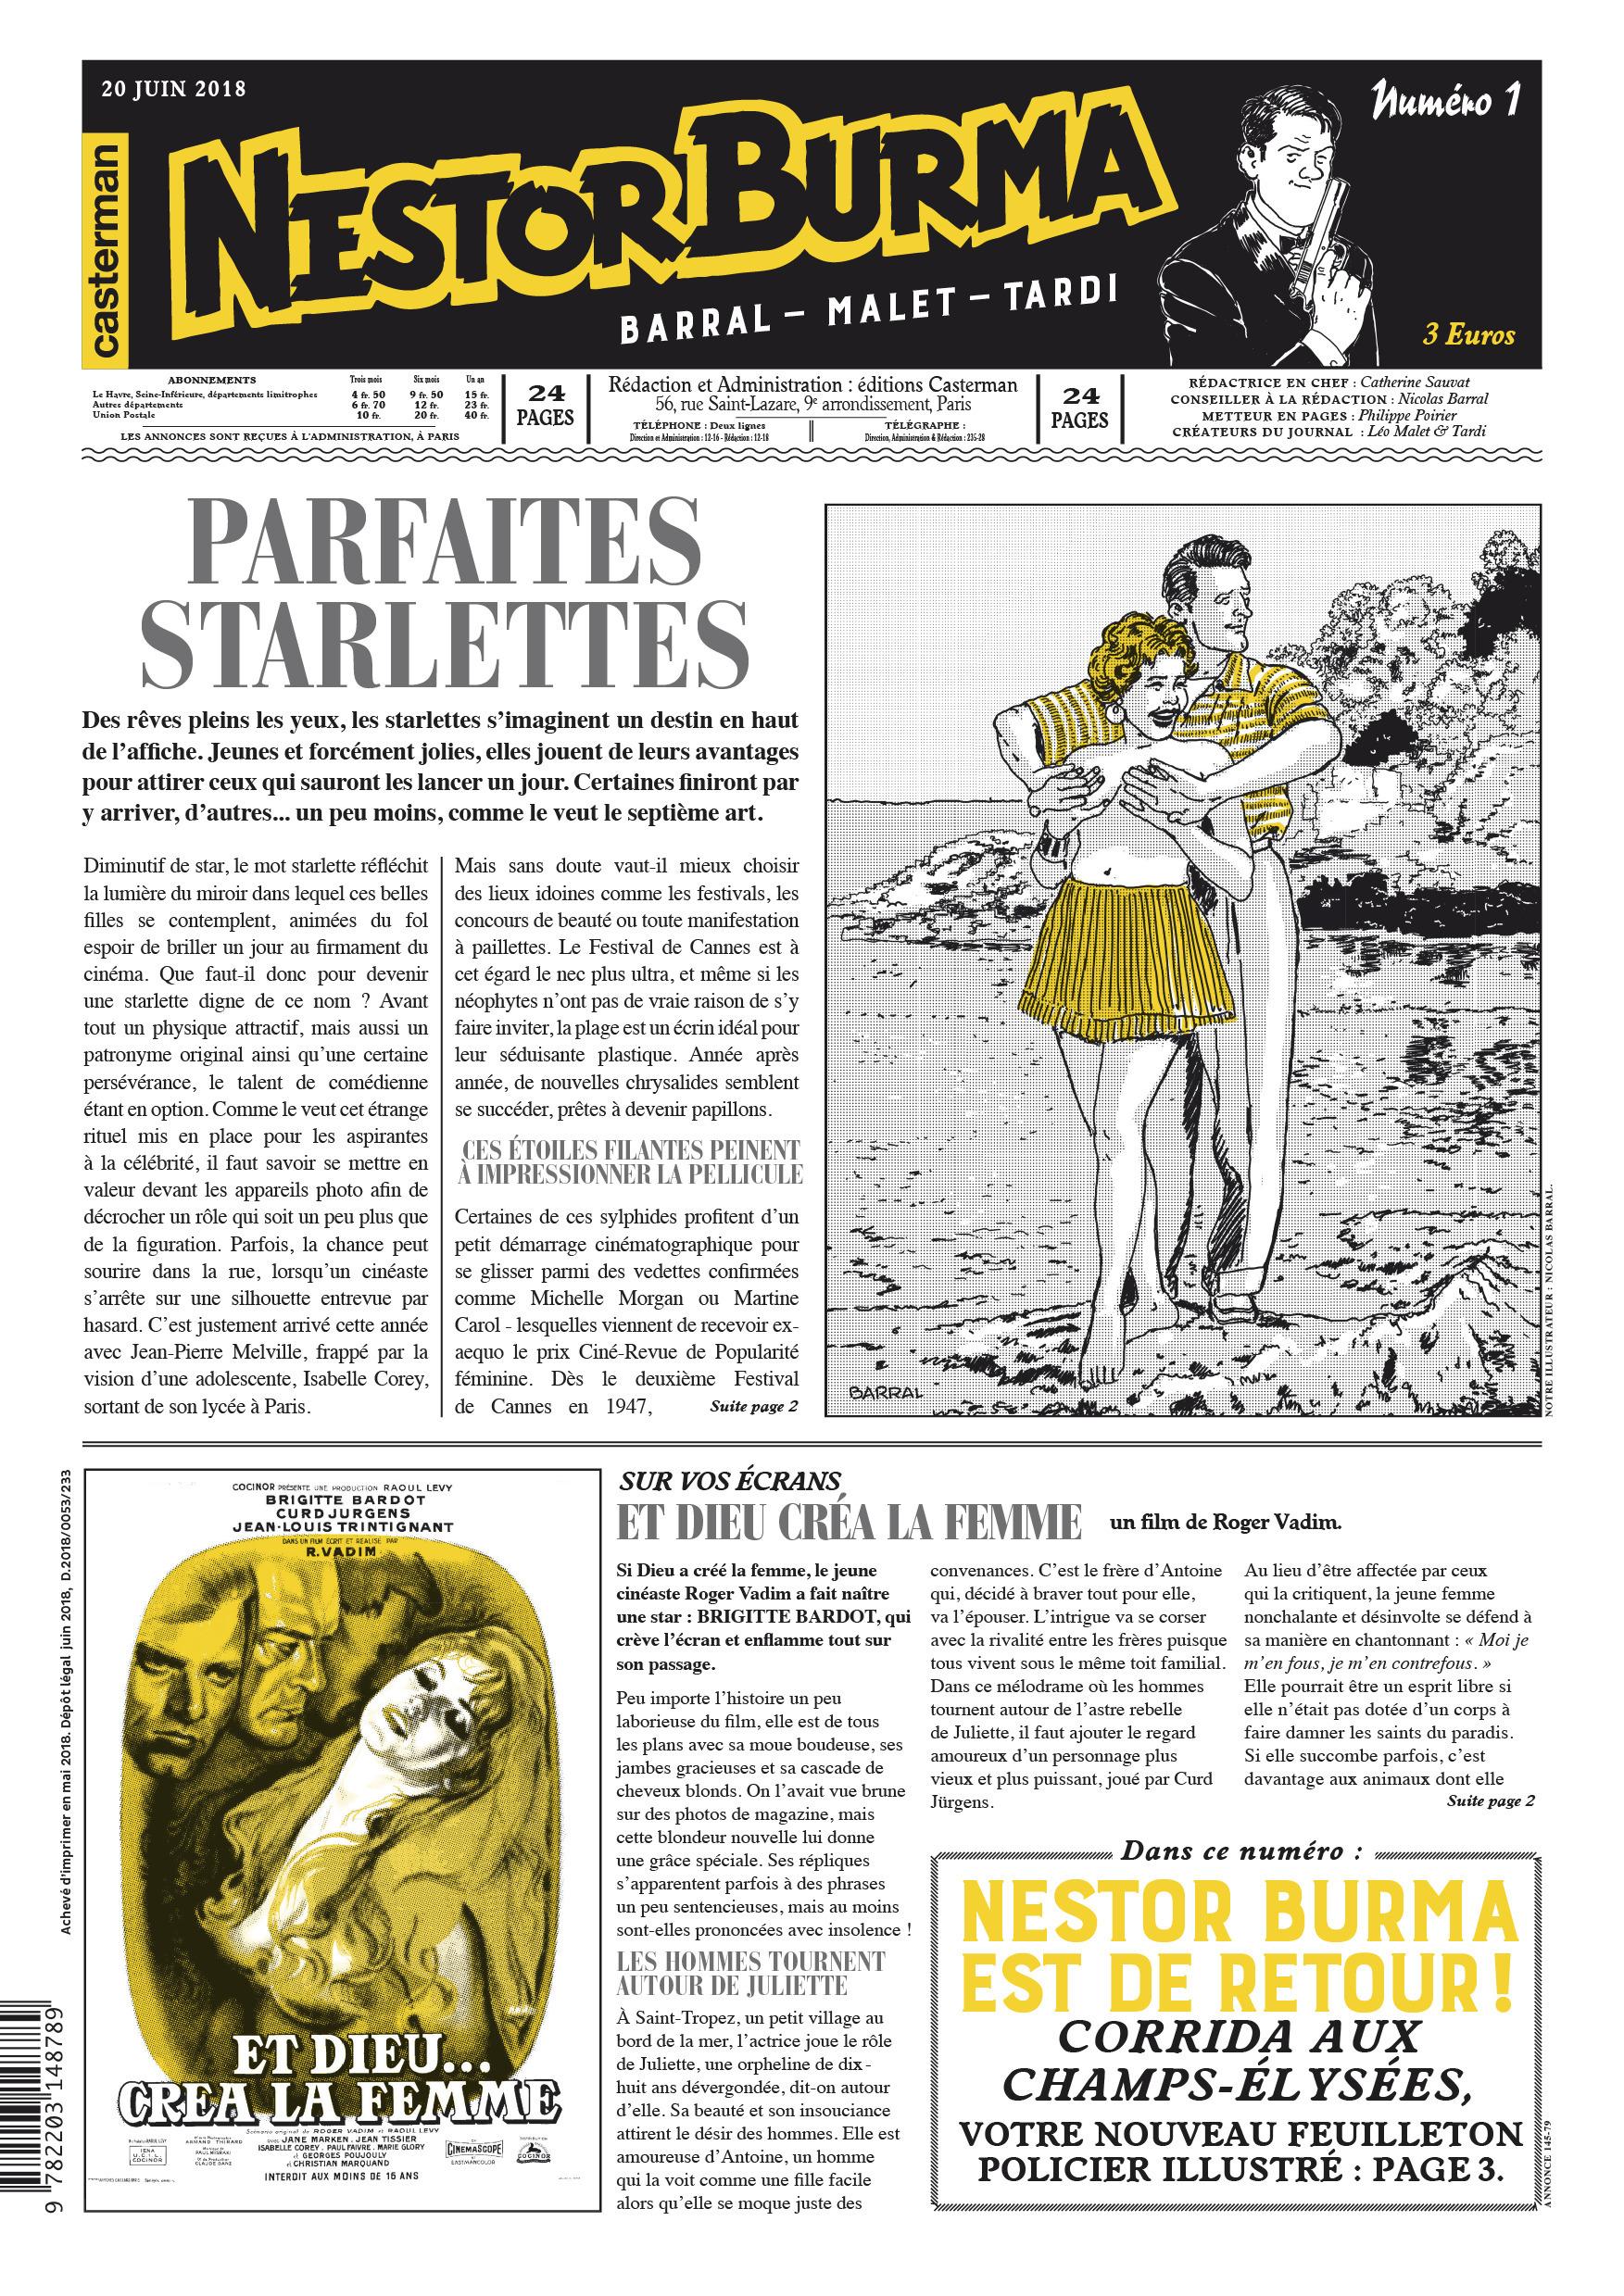 CORRIDA AUX CHAMPS-ELYSEES - JOURNAL NUMERO 1